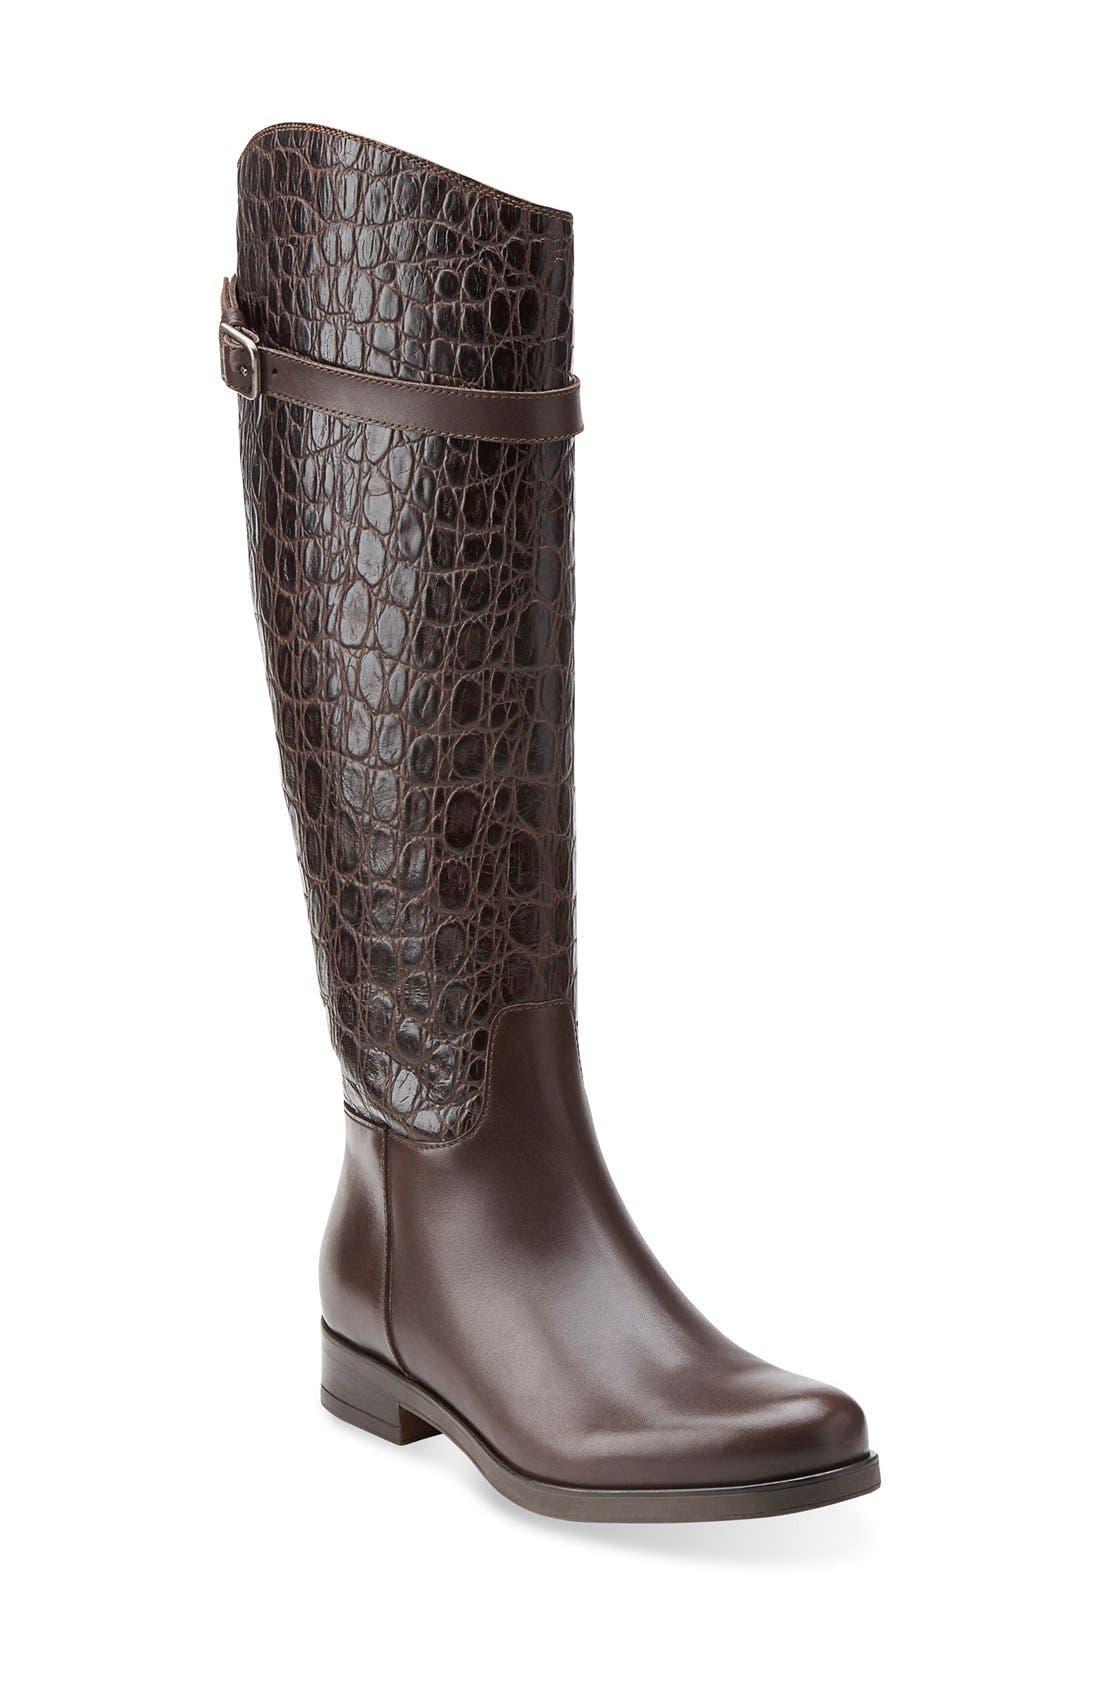 Main Image - Clarks® 'HopedaleWish' Tall Boot (Women)